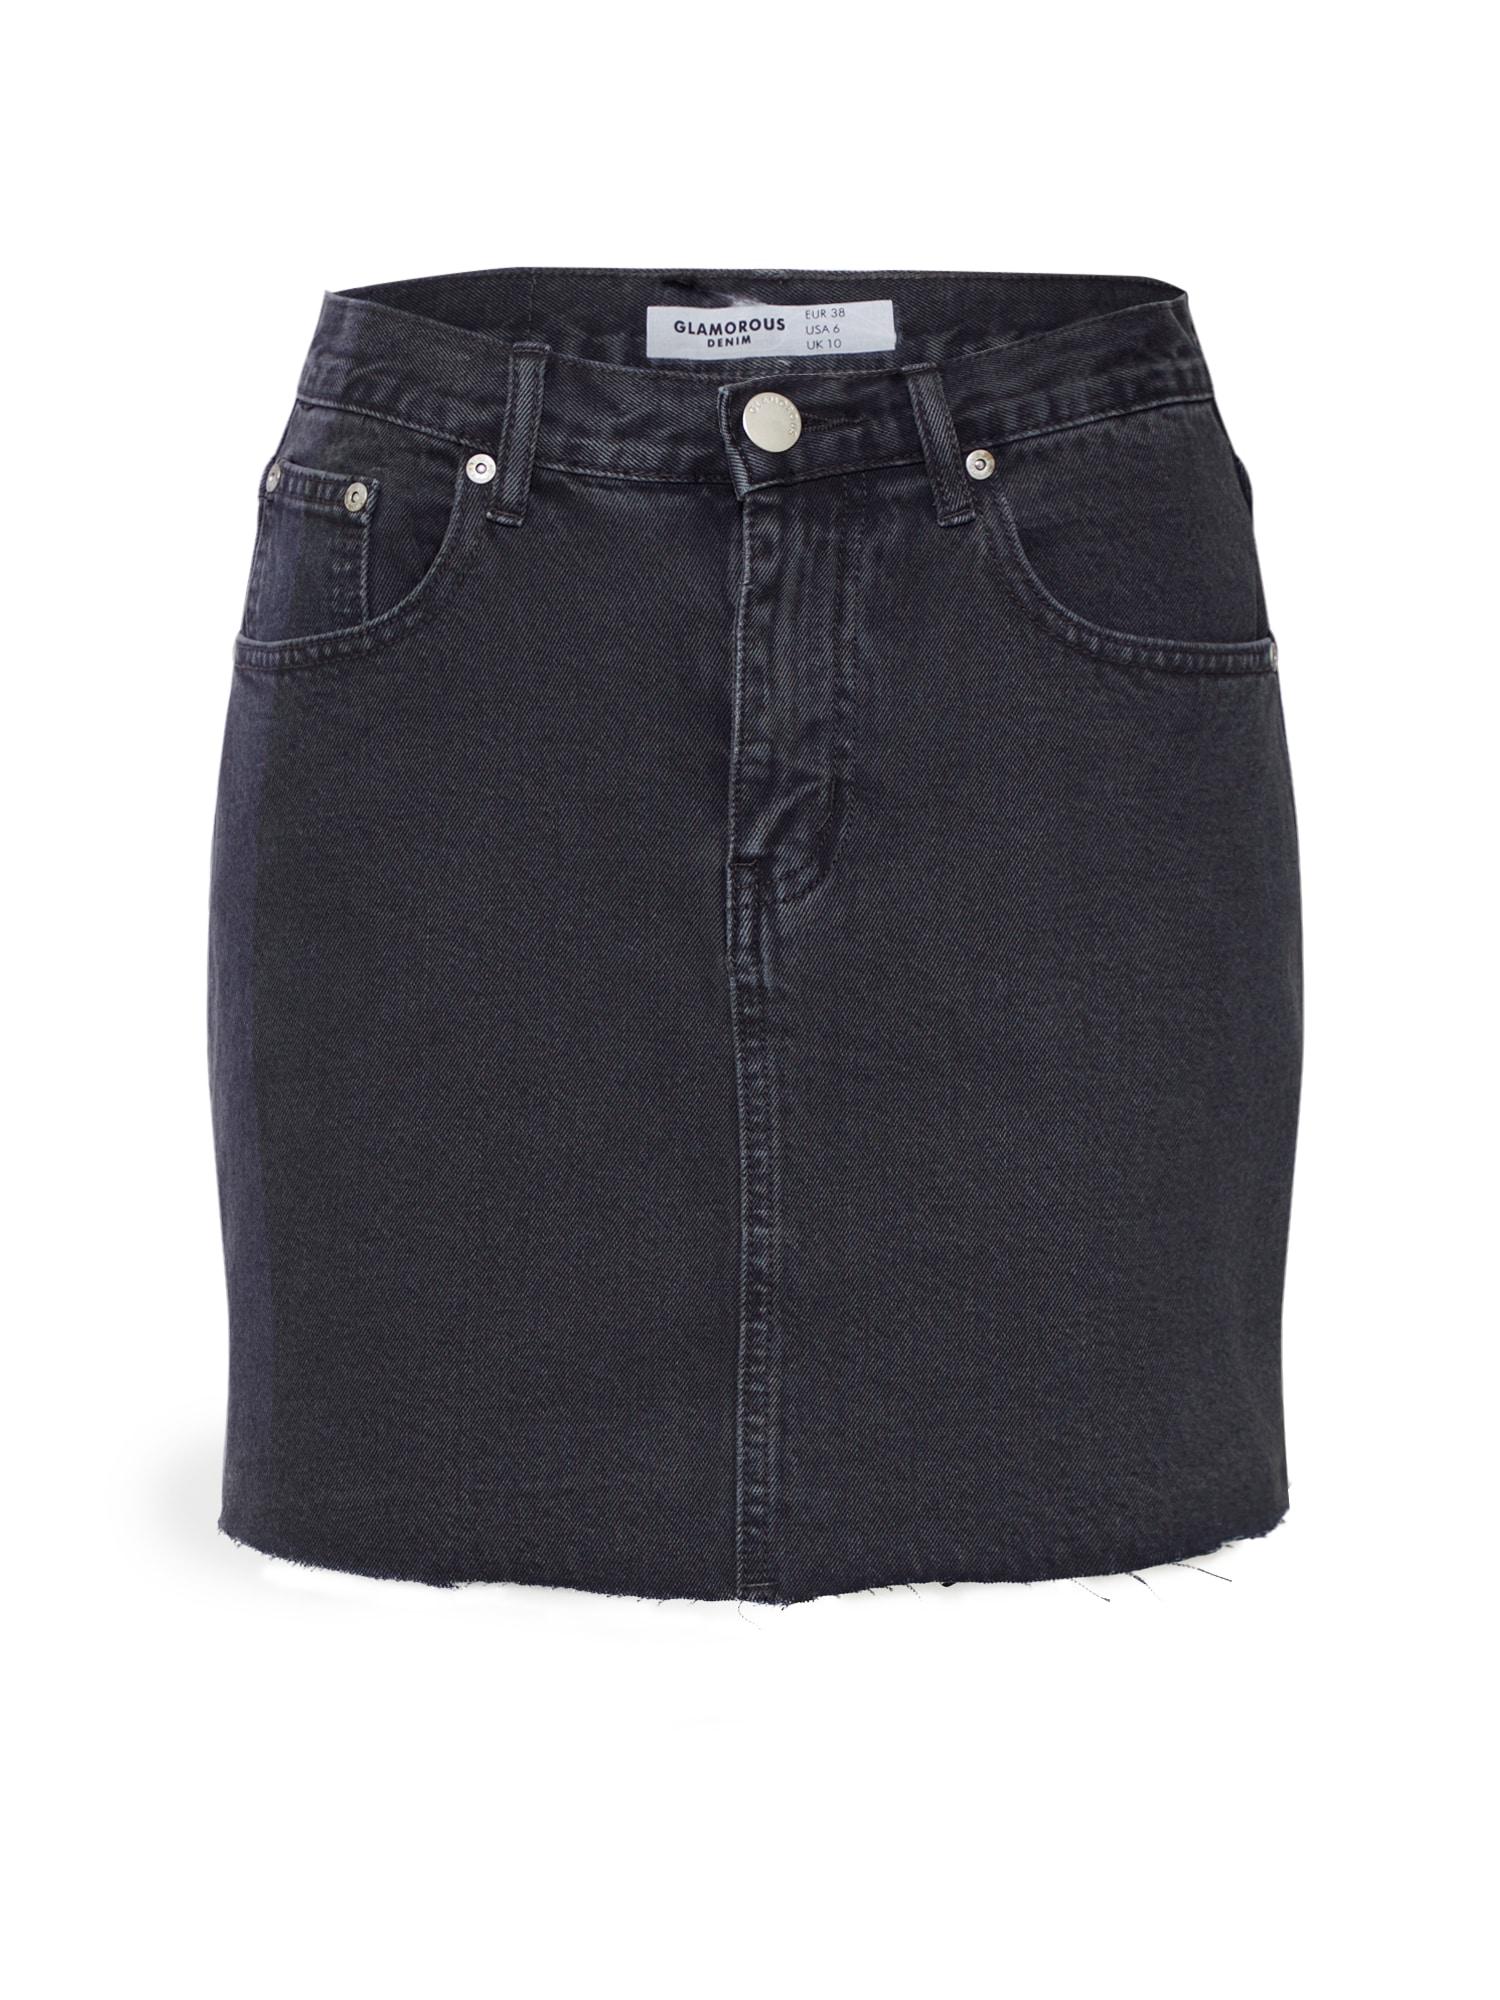 Jeansrock | Bekleidung > Röcke > Jeansröcke | Glamorous